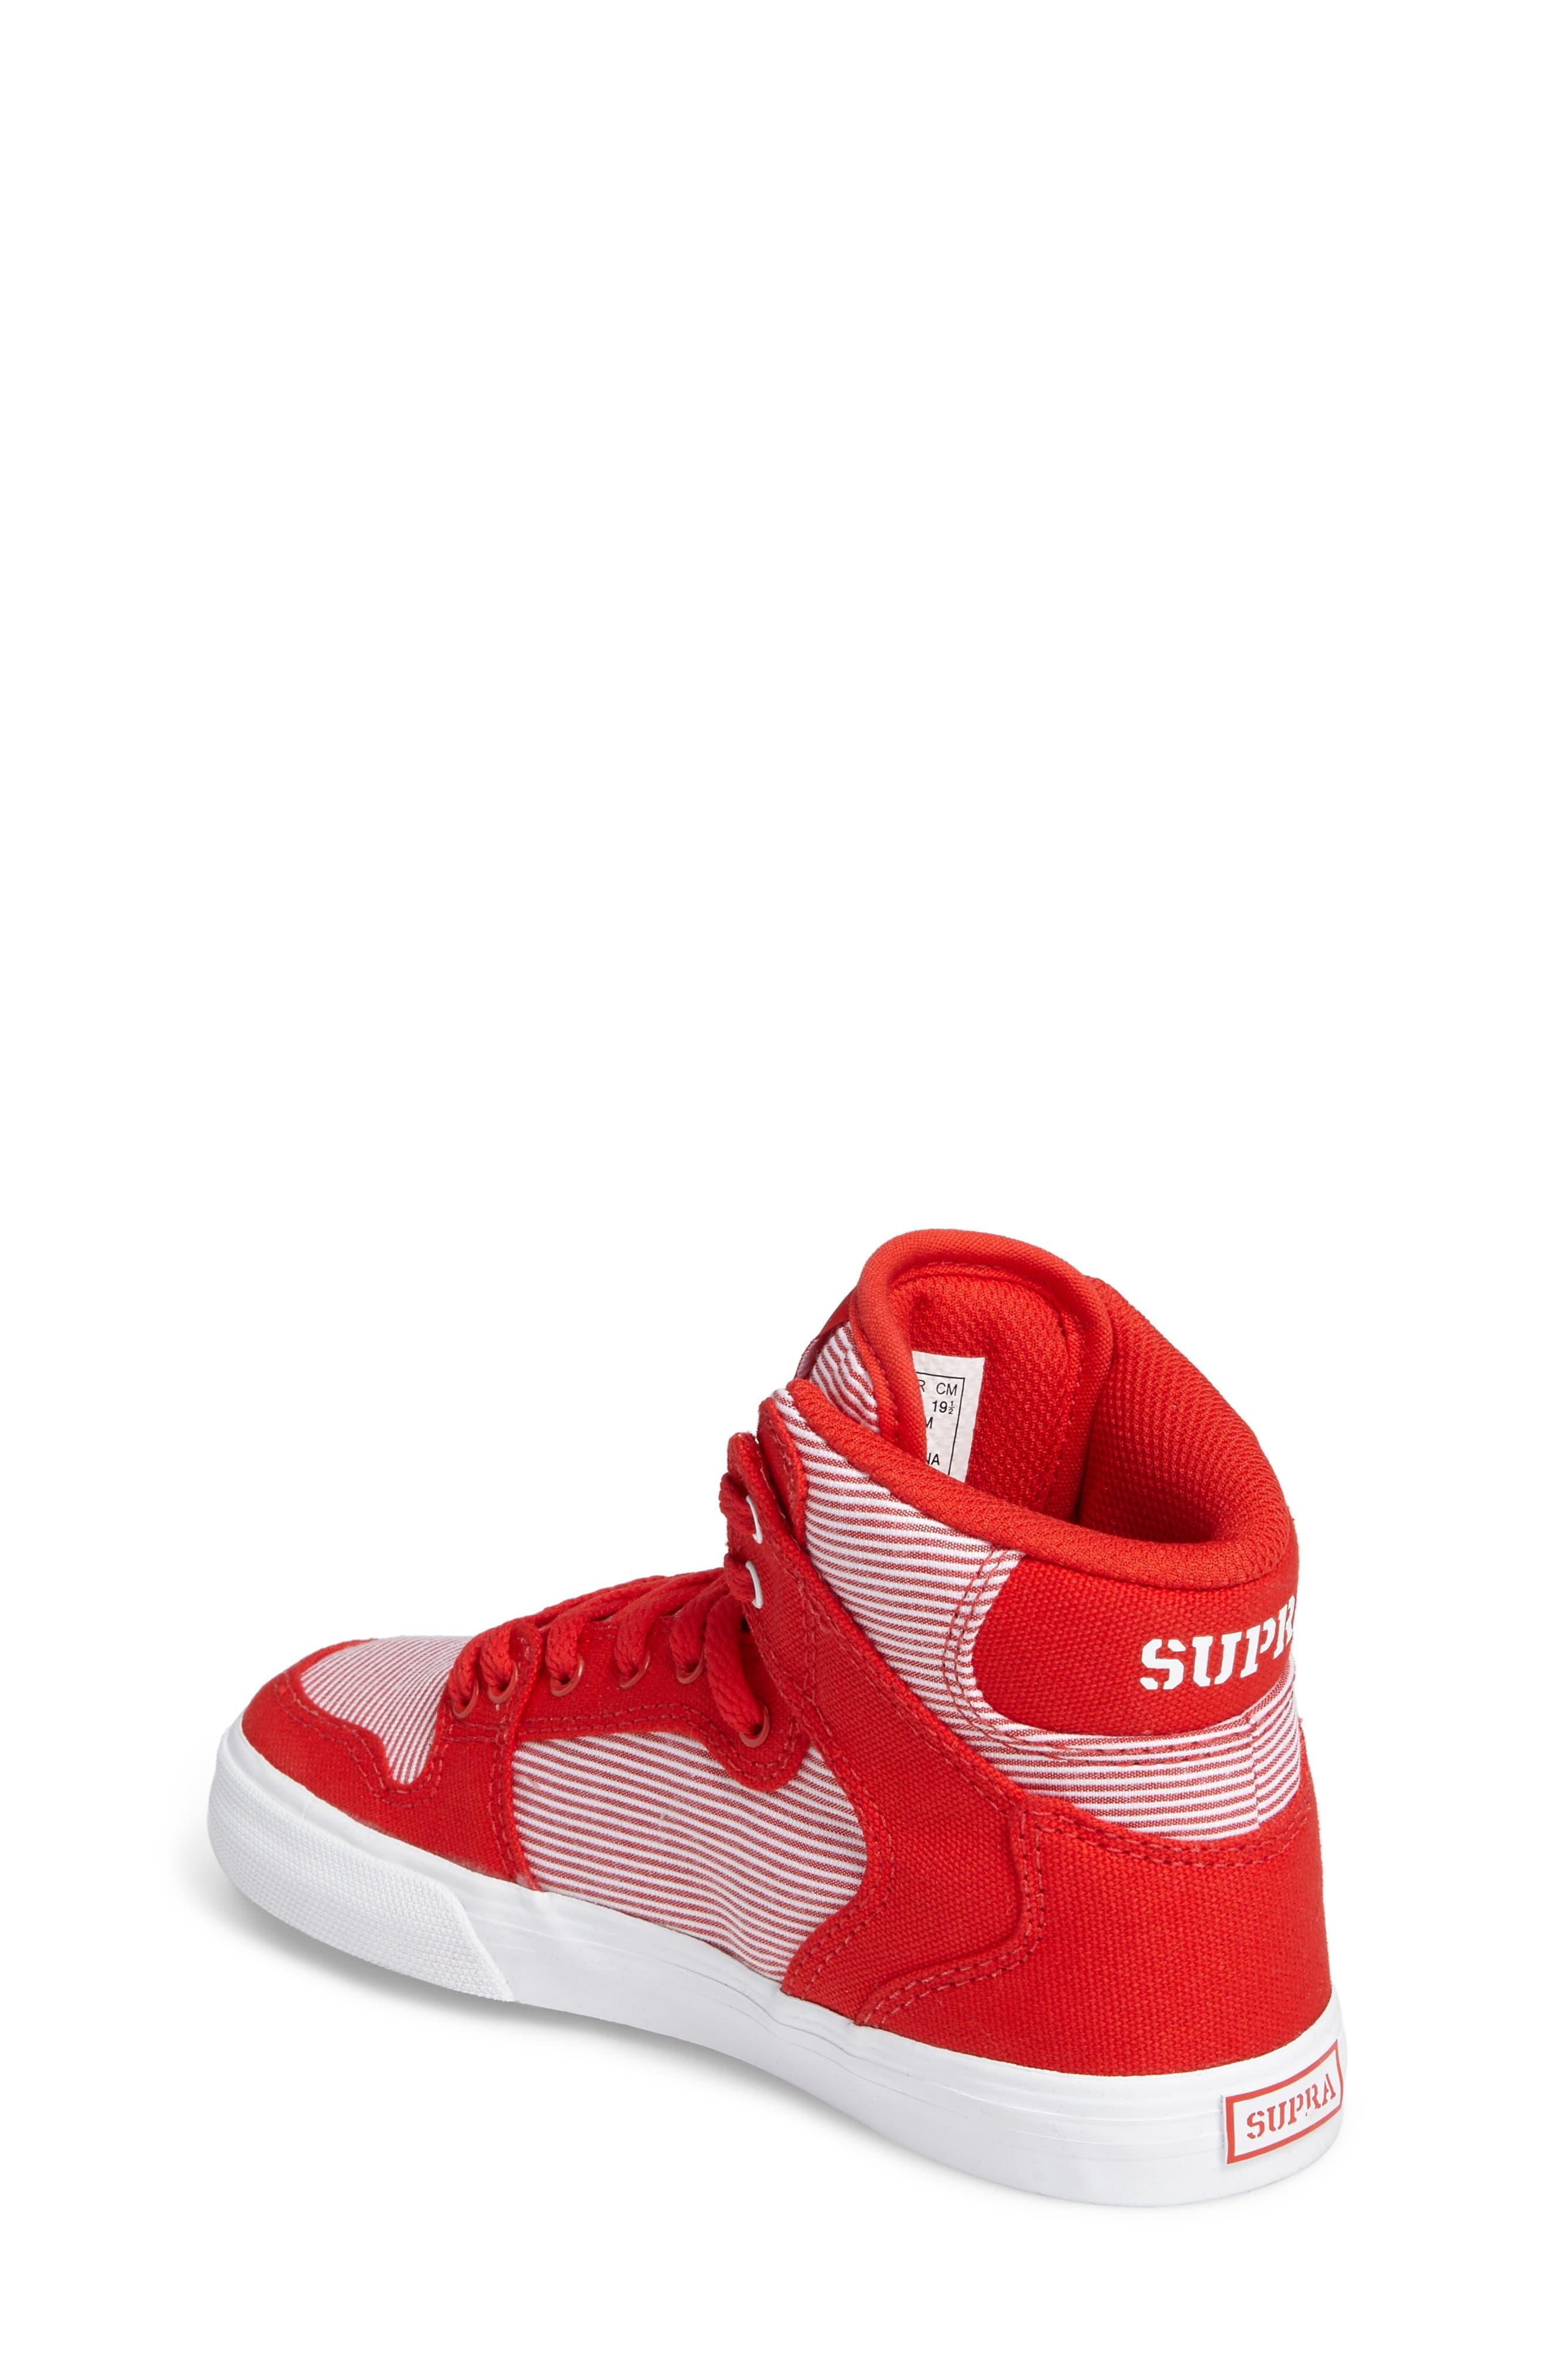 Alternate Image 2  - Supra Vaider High Top Sneaker (Toddler, Little Kid & Big Kid)